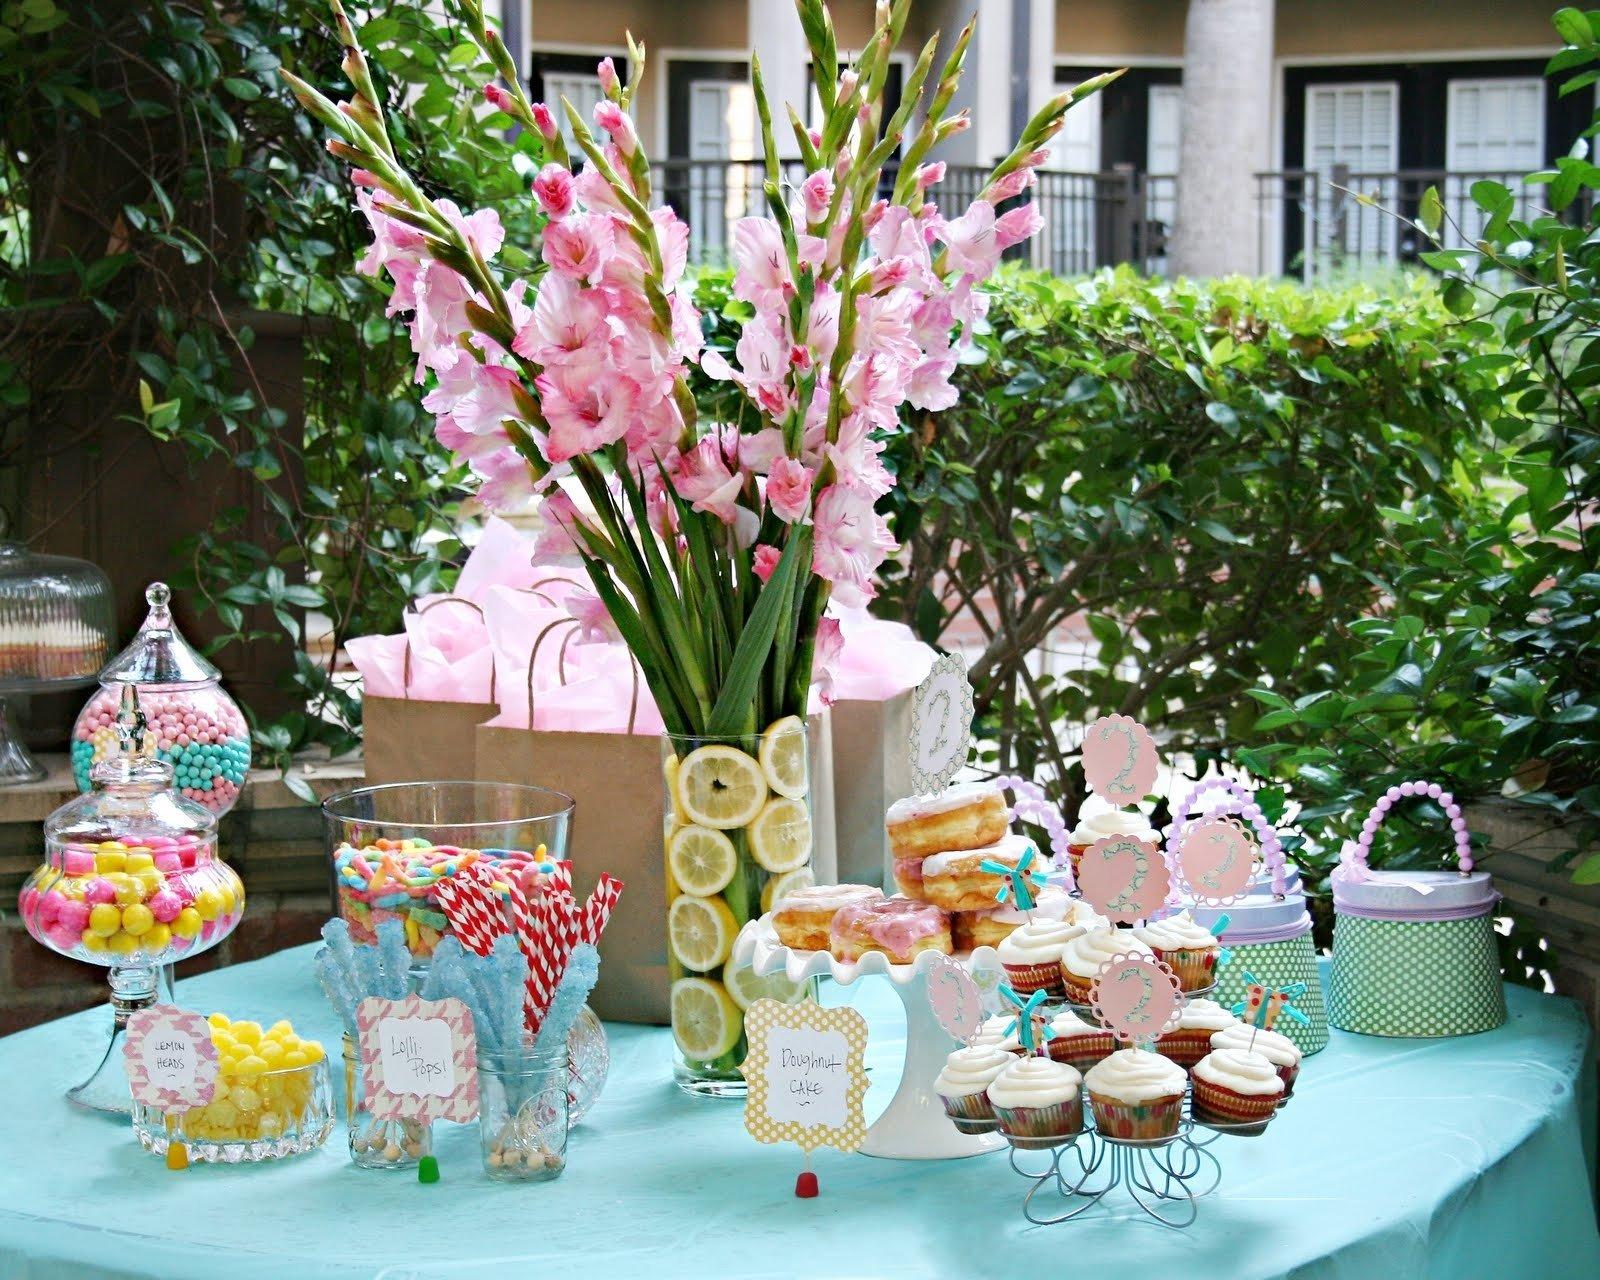 10 Wonderful Sweet 16 Pool Party Ideas sweet sixteen pool party ideas on 1500x1200 sweet 16 pool party 2020